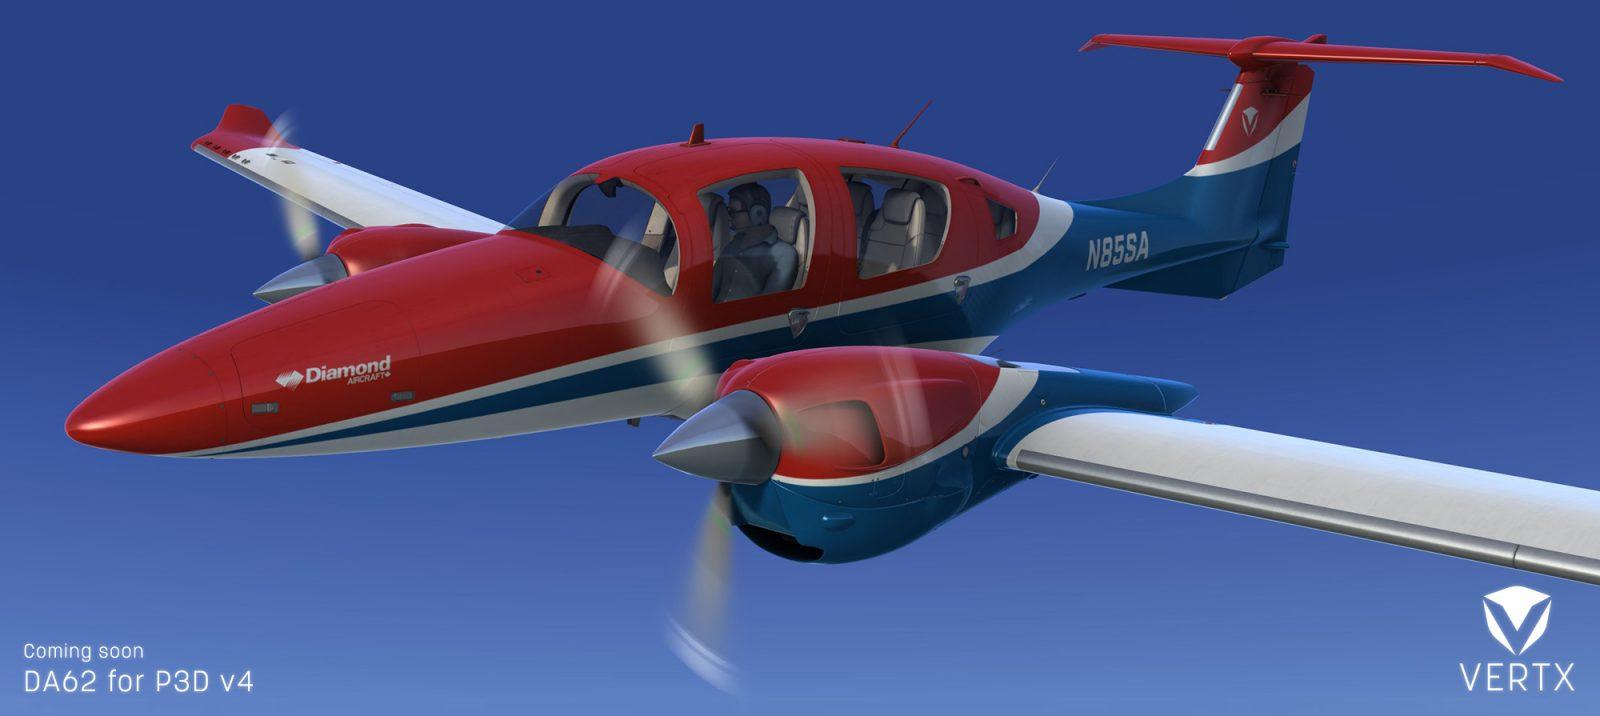 http://pilote-virtuel.com/img/gallery/1539987514.jpg